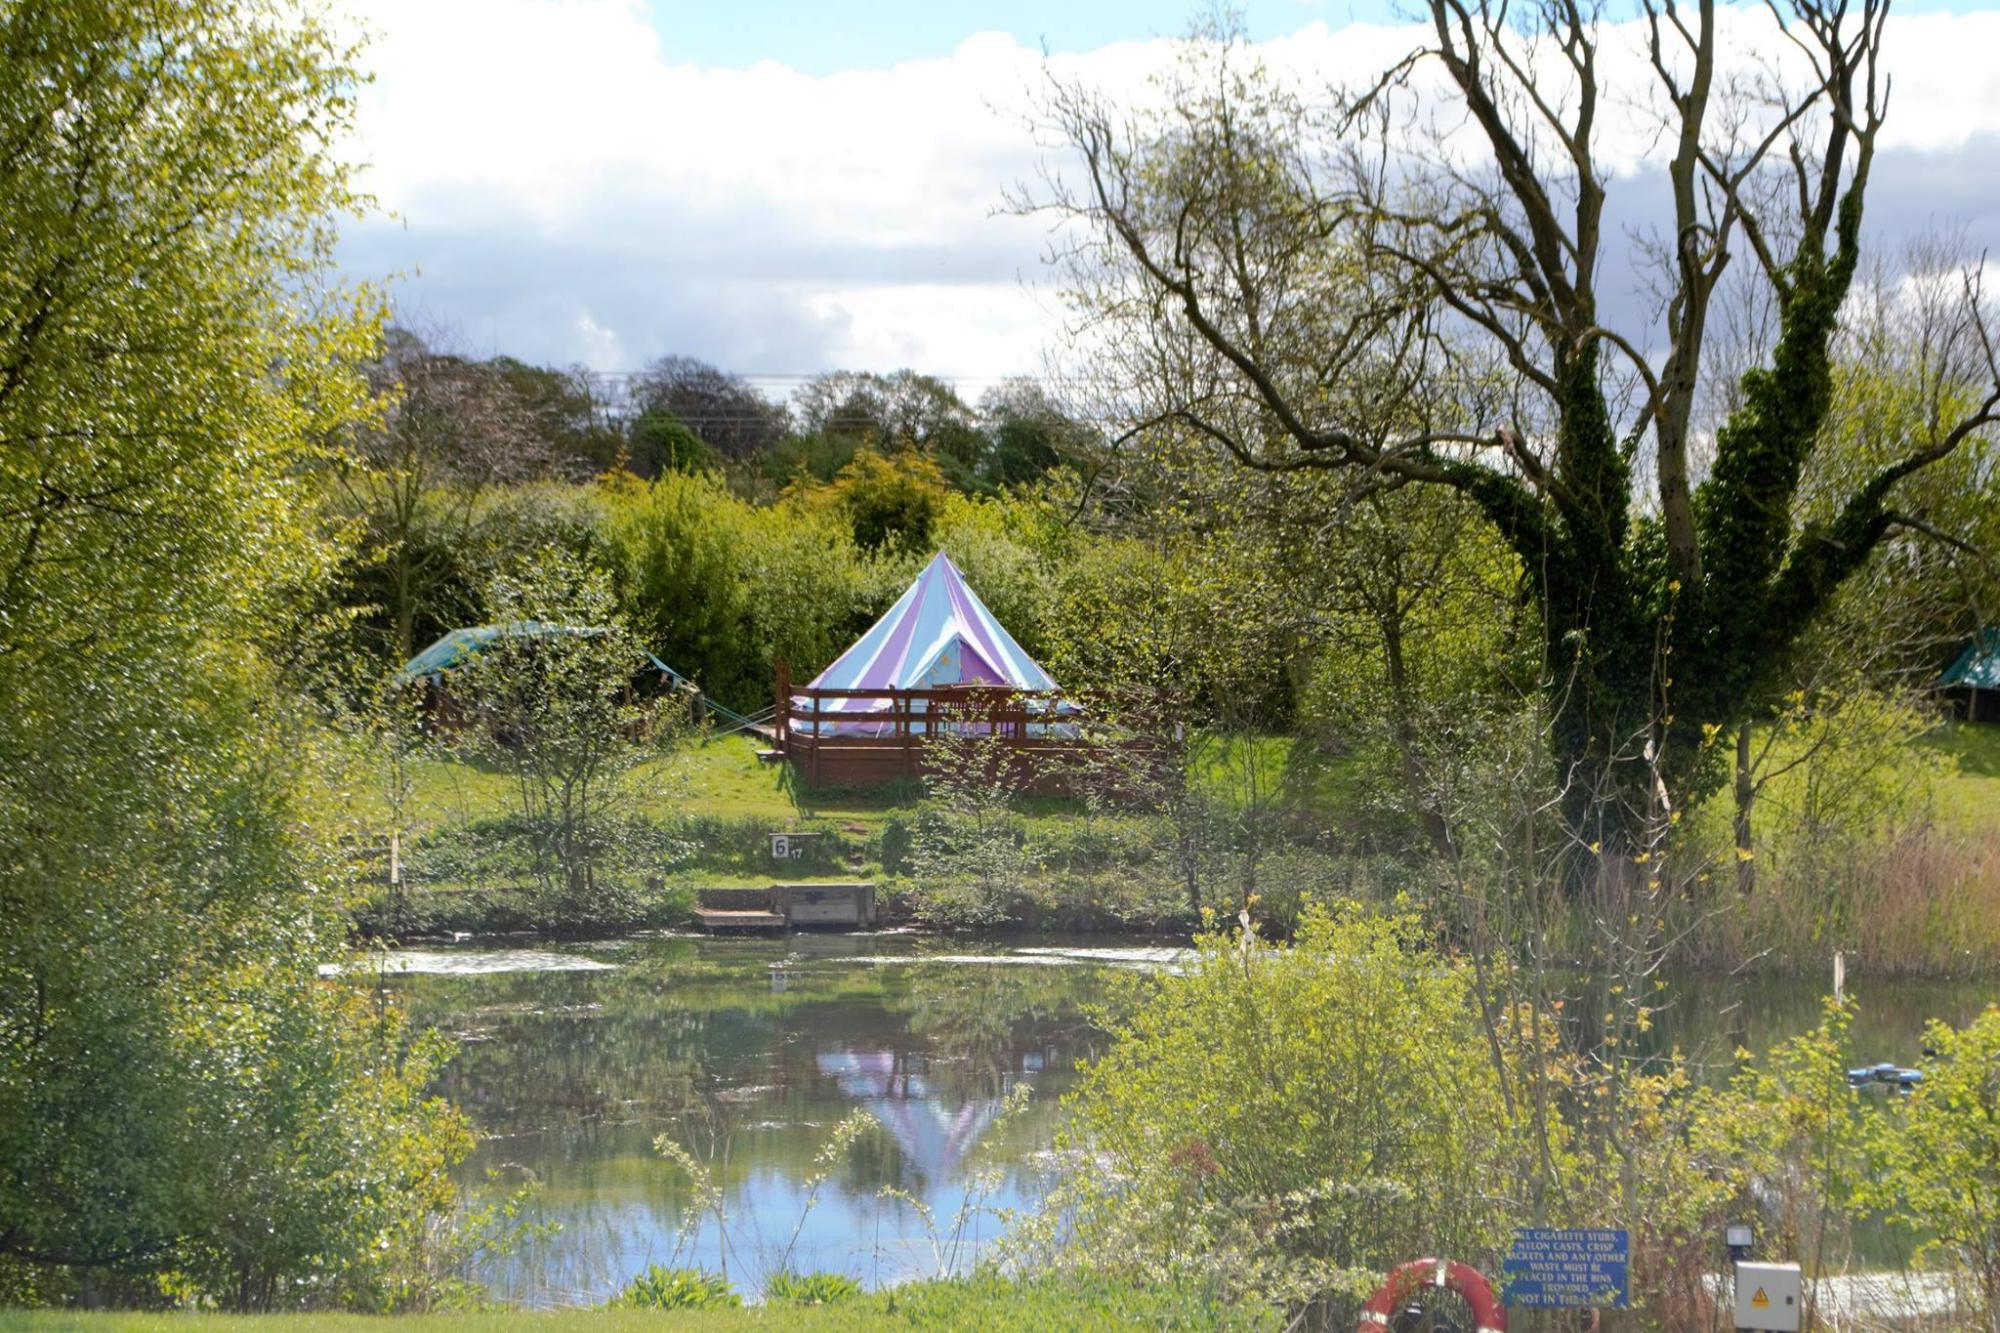 Glamping in Northallerton holidays at Cool Camping